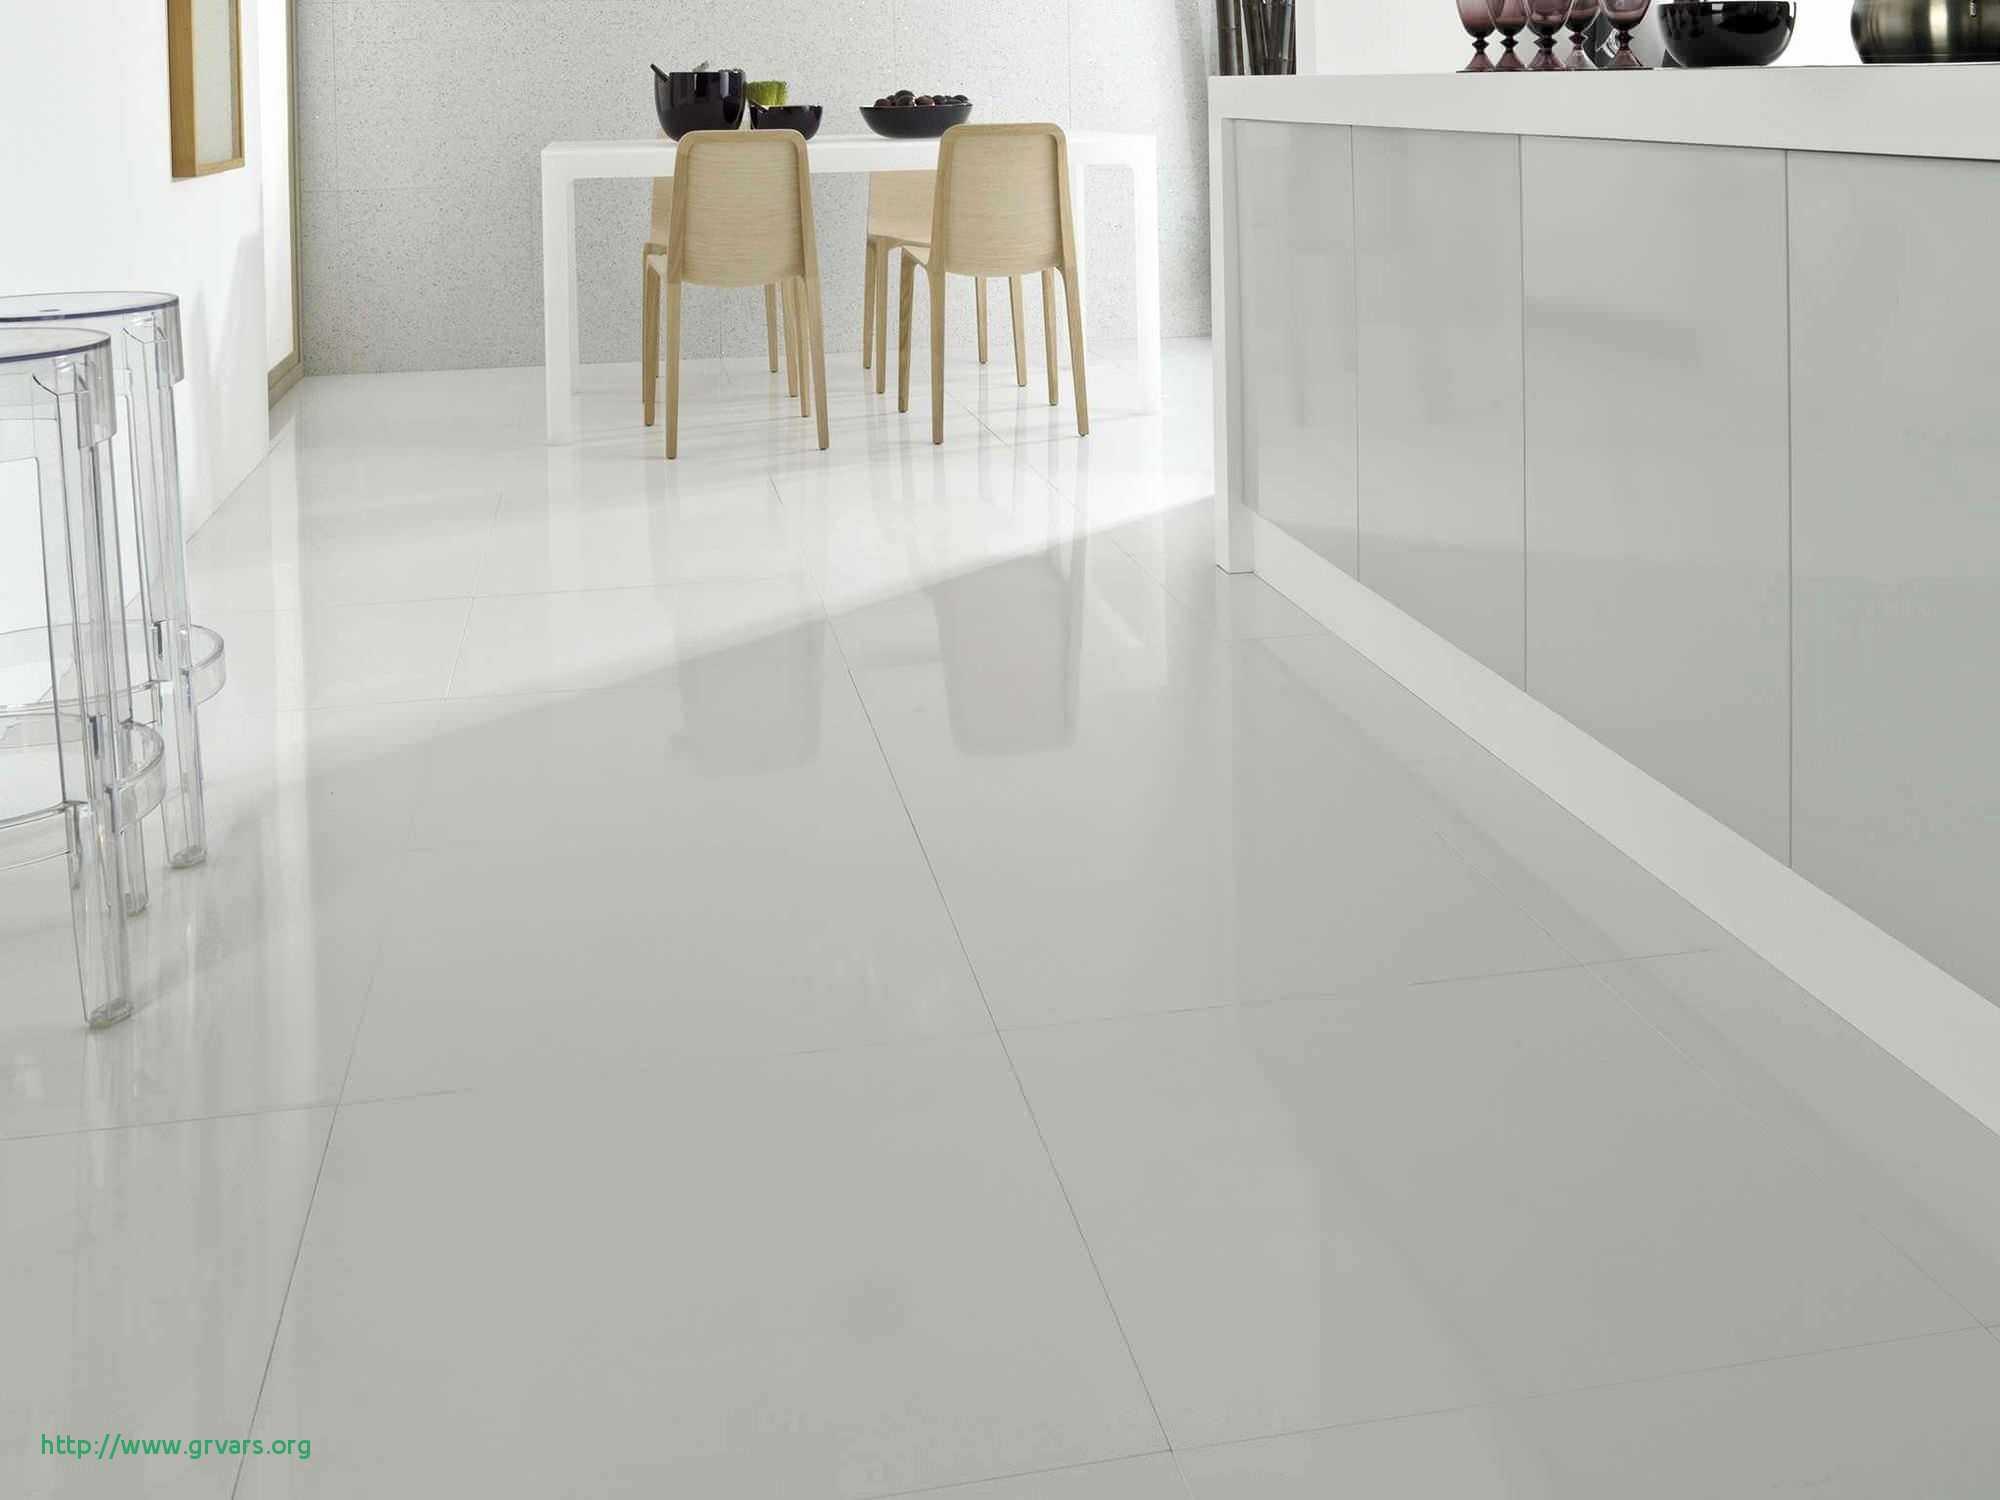 hardwood flooring dallas ga of 24 beau elite flooring and design ideas blog with regard to elite flooring and design a‰lagant lovely interiors design deep clean tile floor inspirational egal od